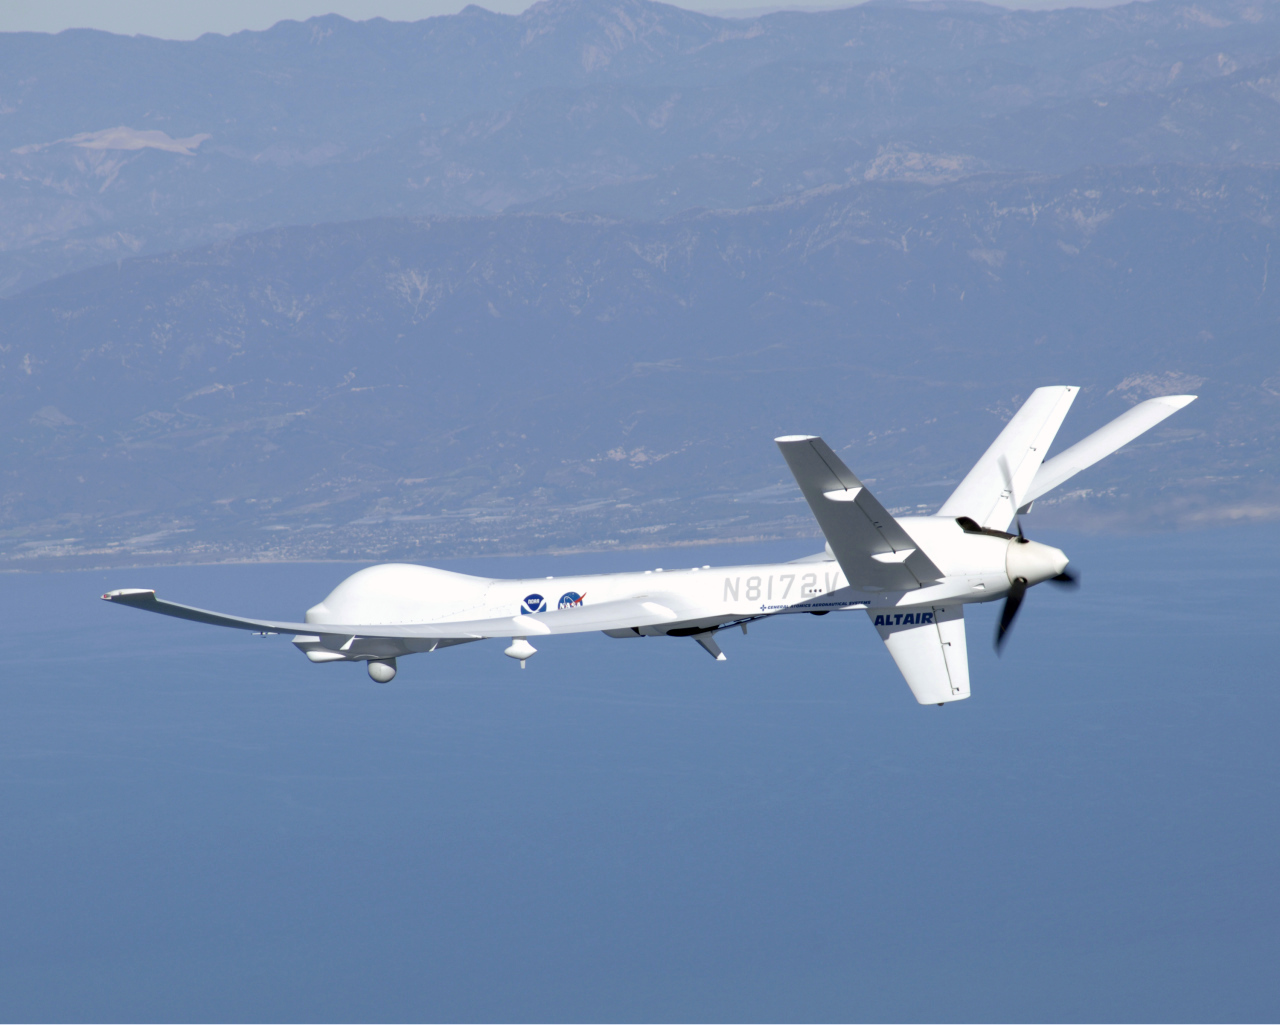 General Atomics MQ-9 Reaper | Military Wiki | FANDOM powered by Wikia